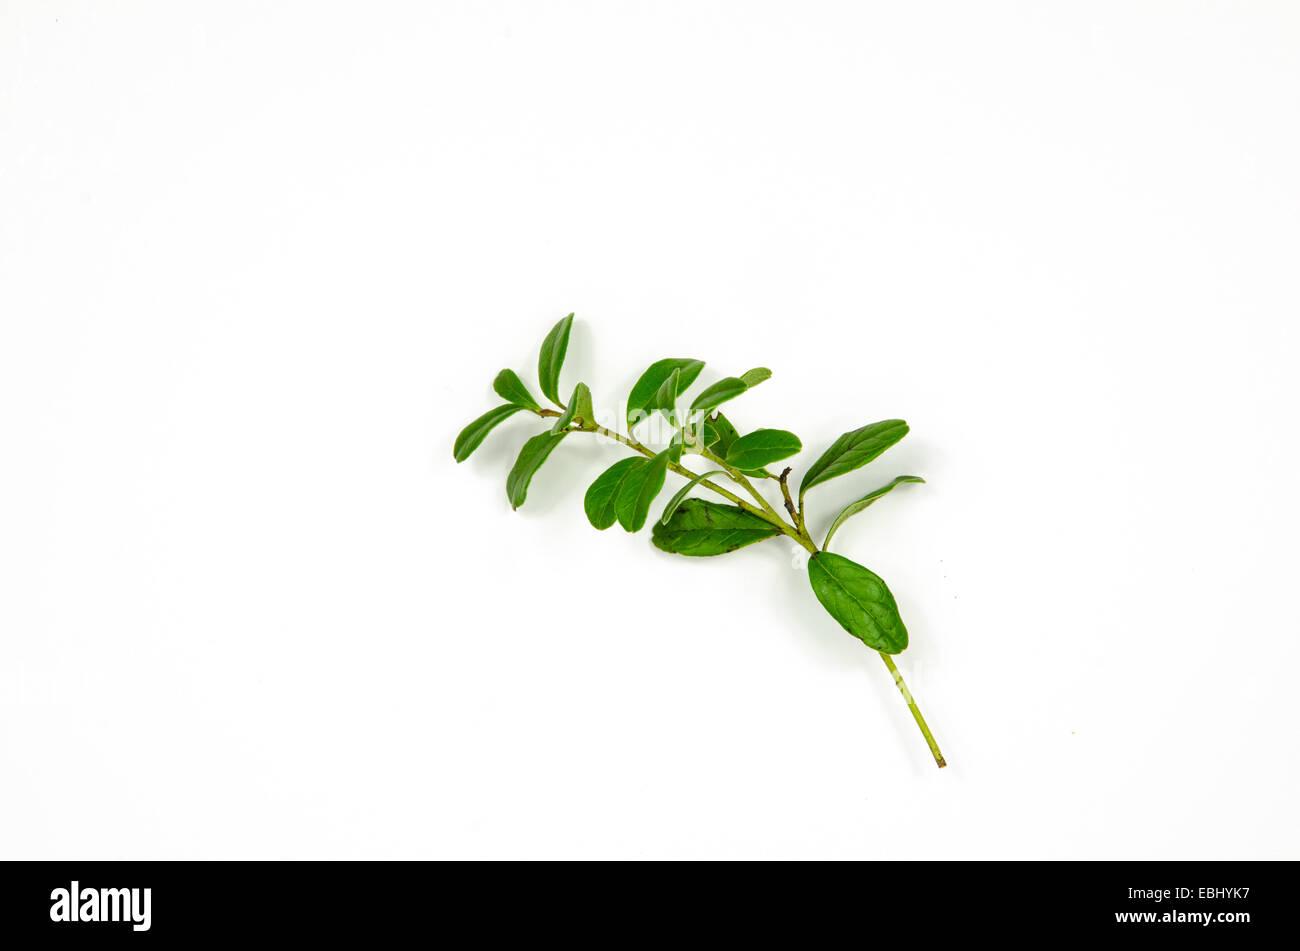 Single lingonberry twig decoration at white background - Stock Image